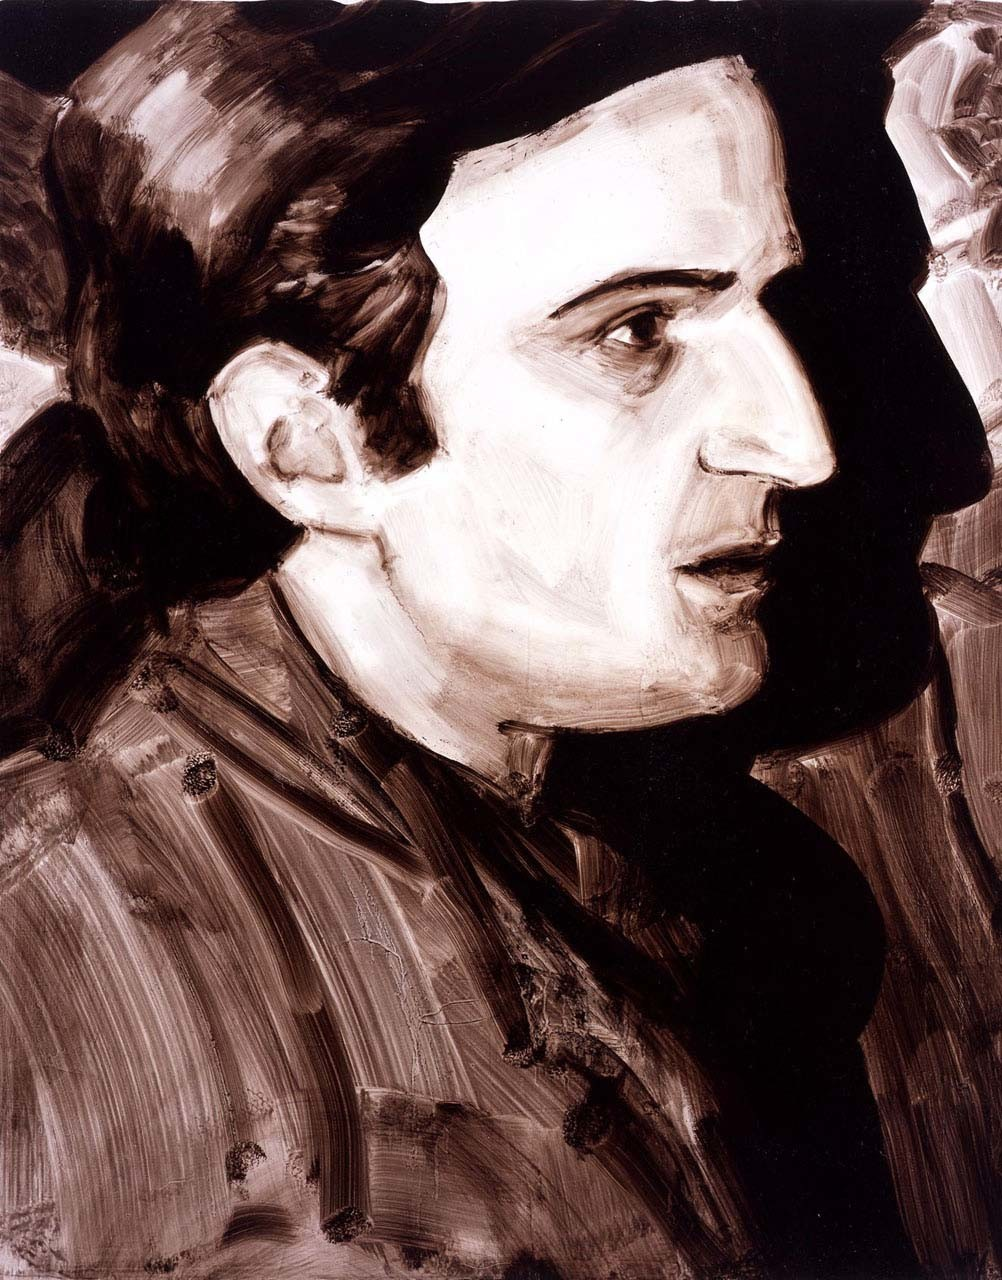 "<div class=""artwork_caption""><p>Truffaut at the Cinematheque 1968 (François Truffaut), 2005</p></div>"